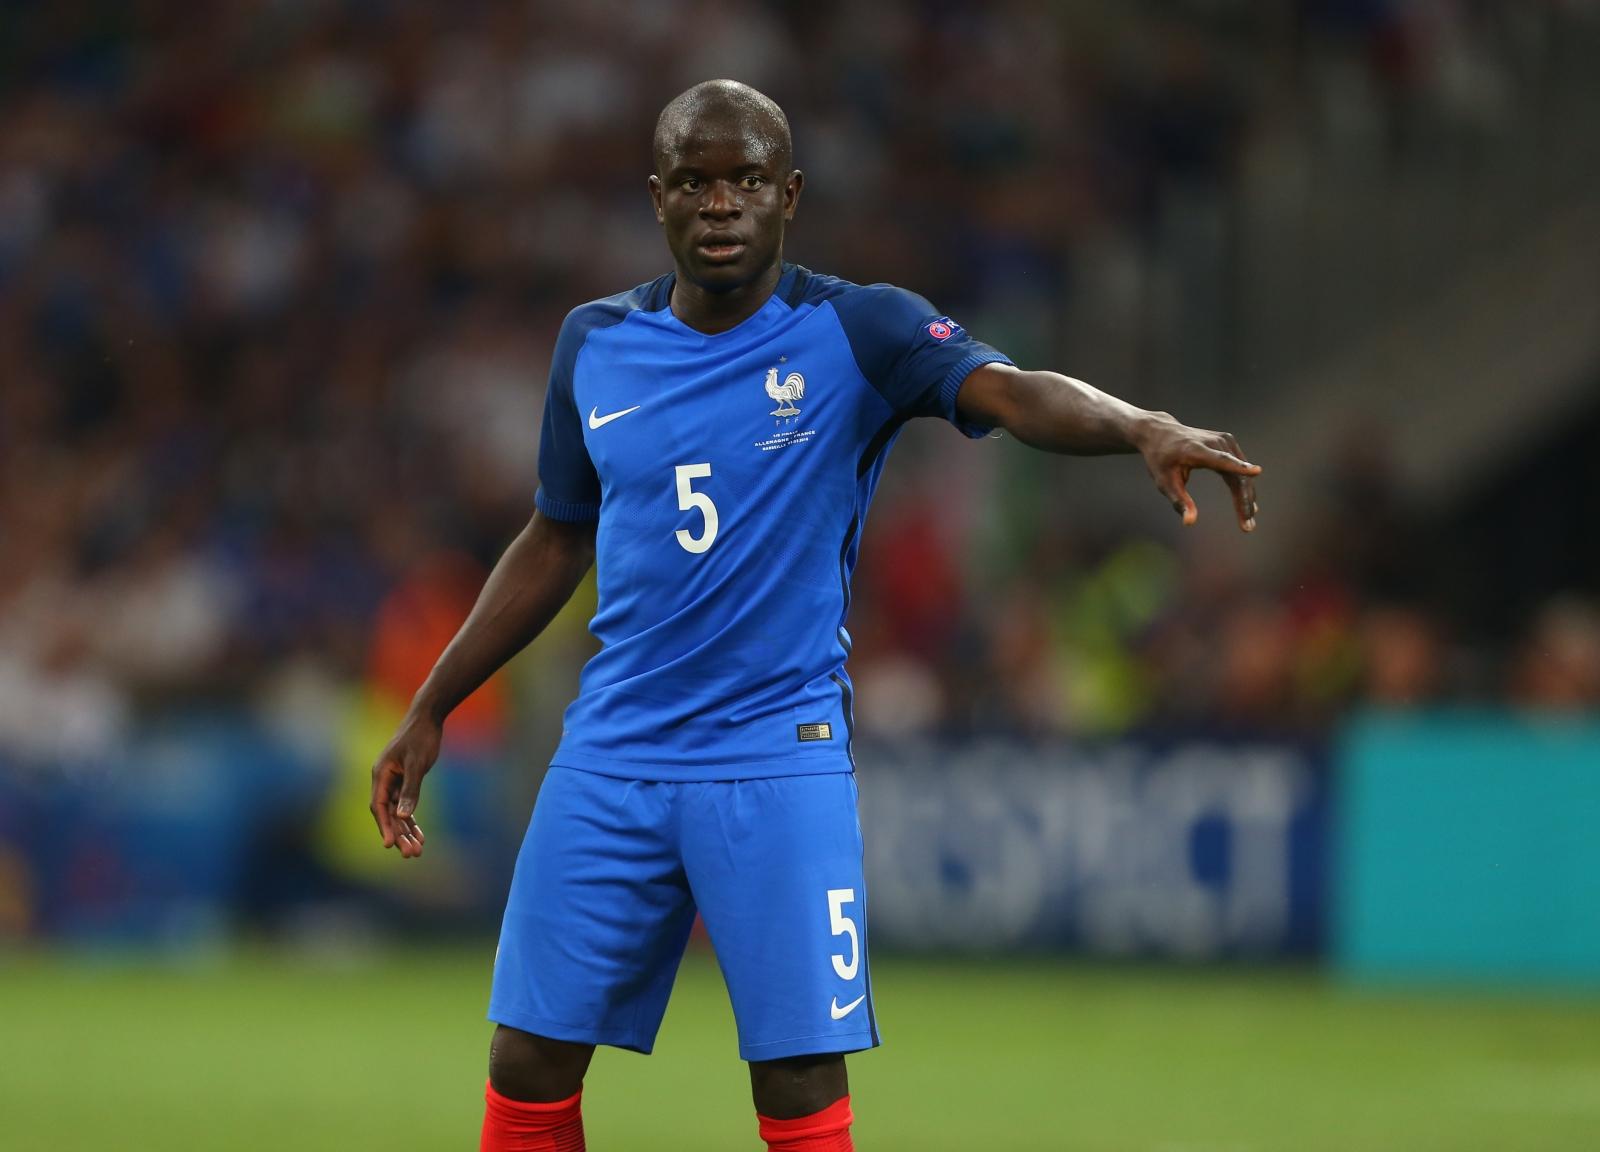 Chelsea Transfer News: N'Golo Kante Reveals Antonio Conte